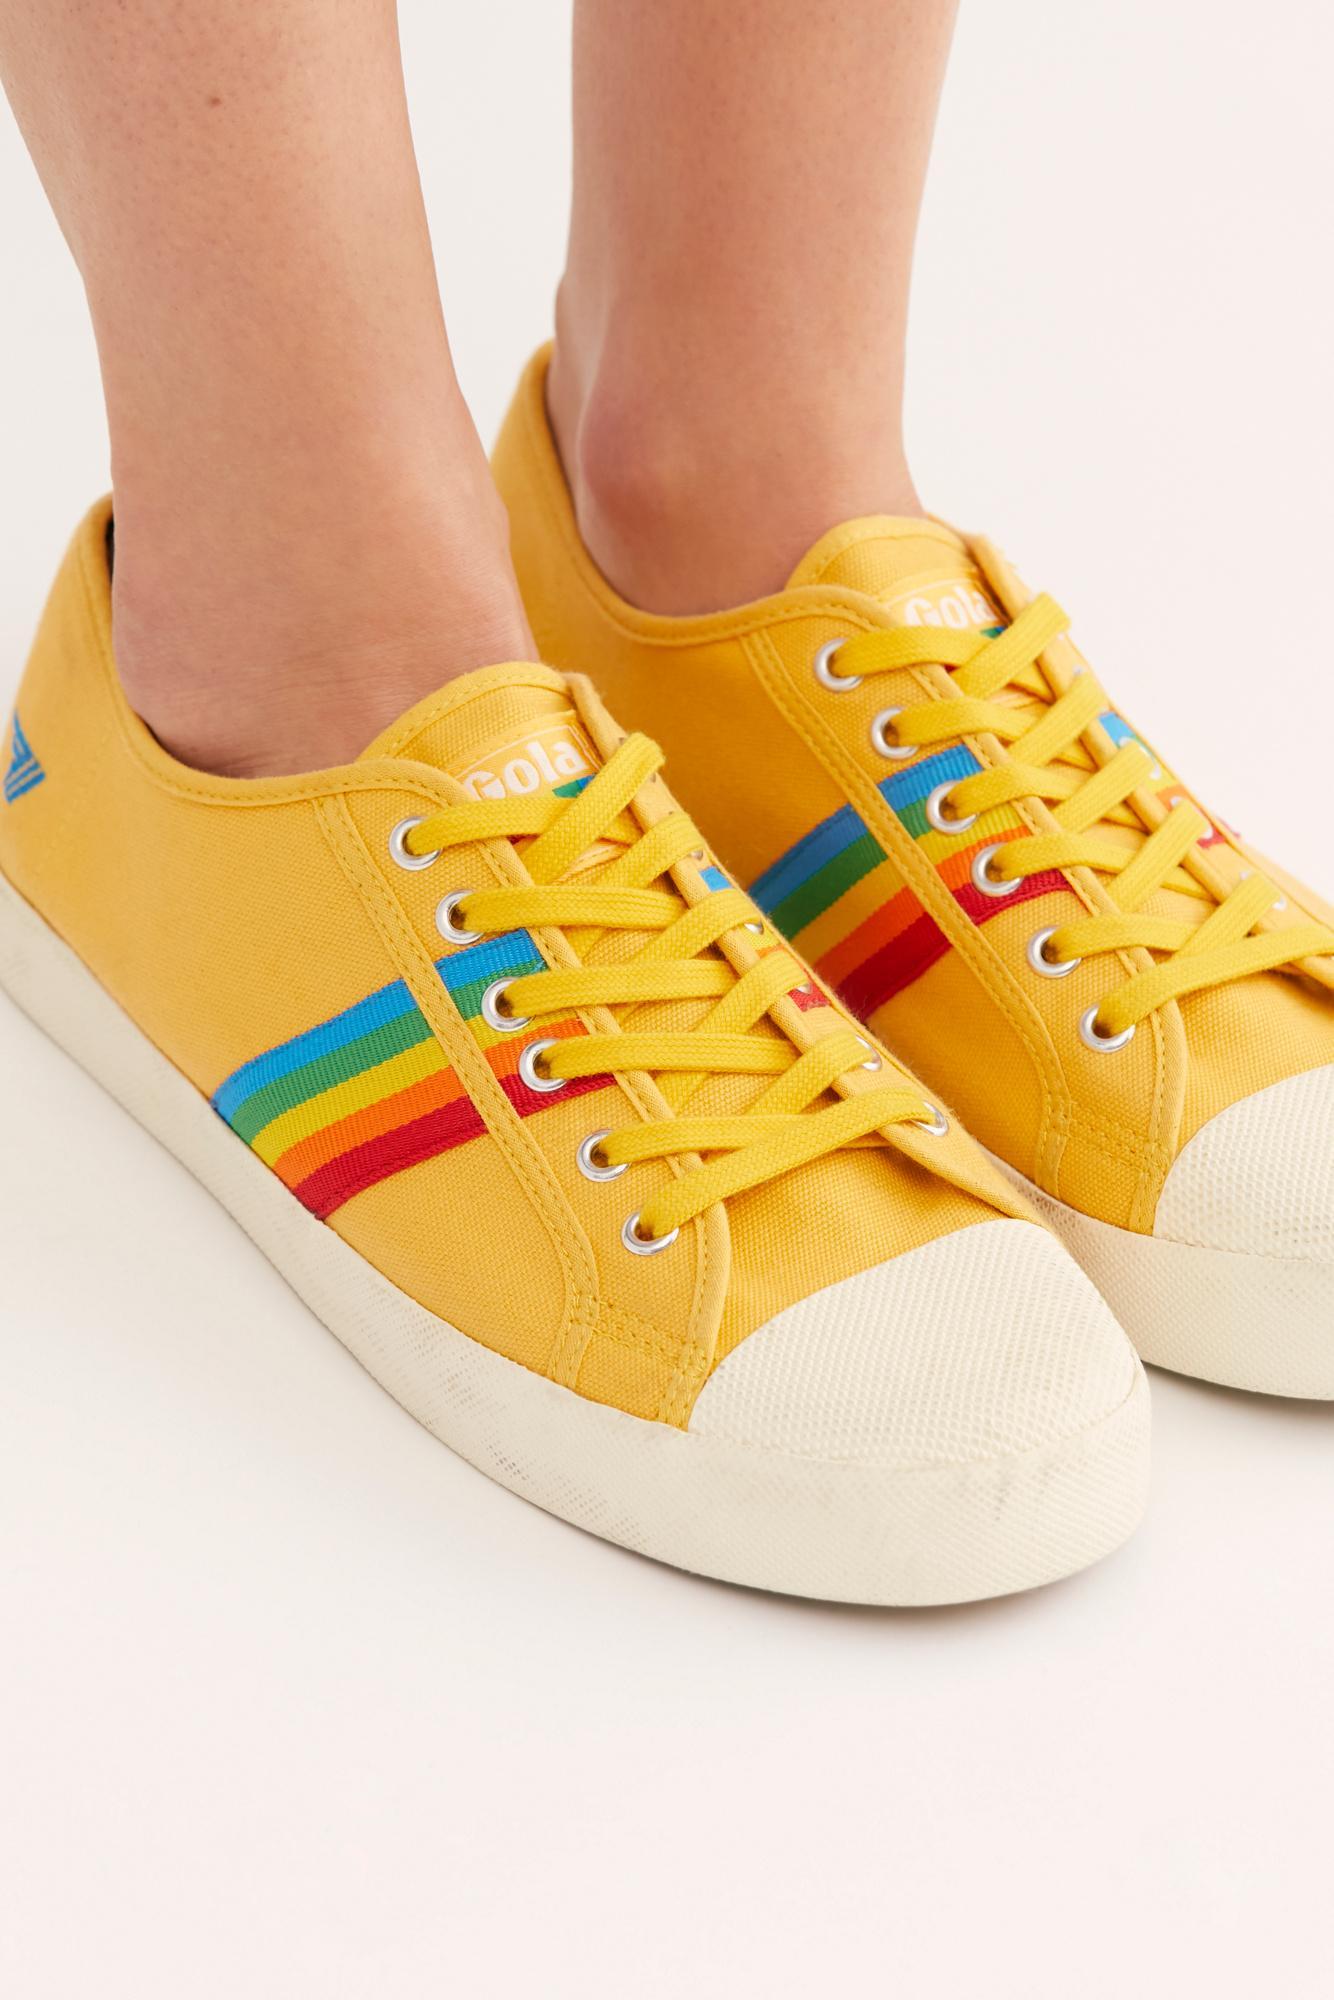 Canvas Gola Coaster Rainbow Sneakers - Lyst